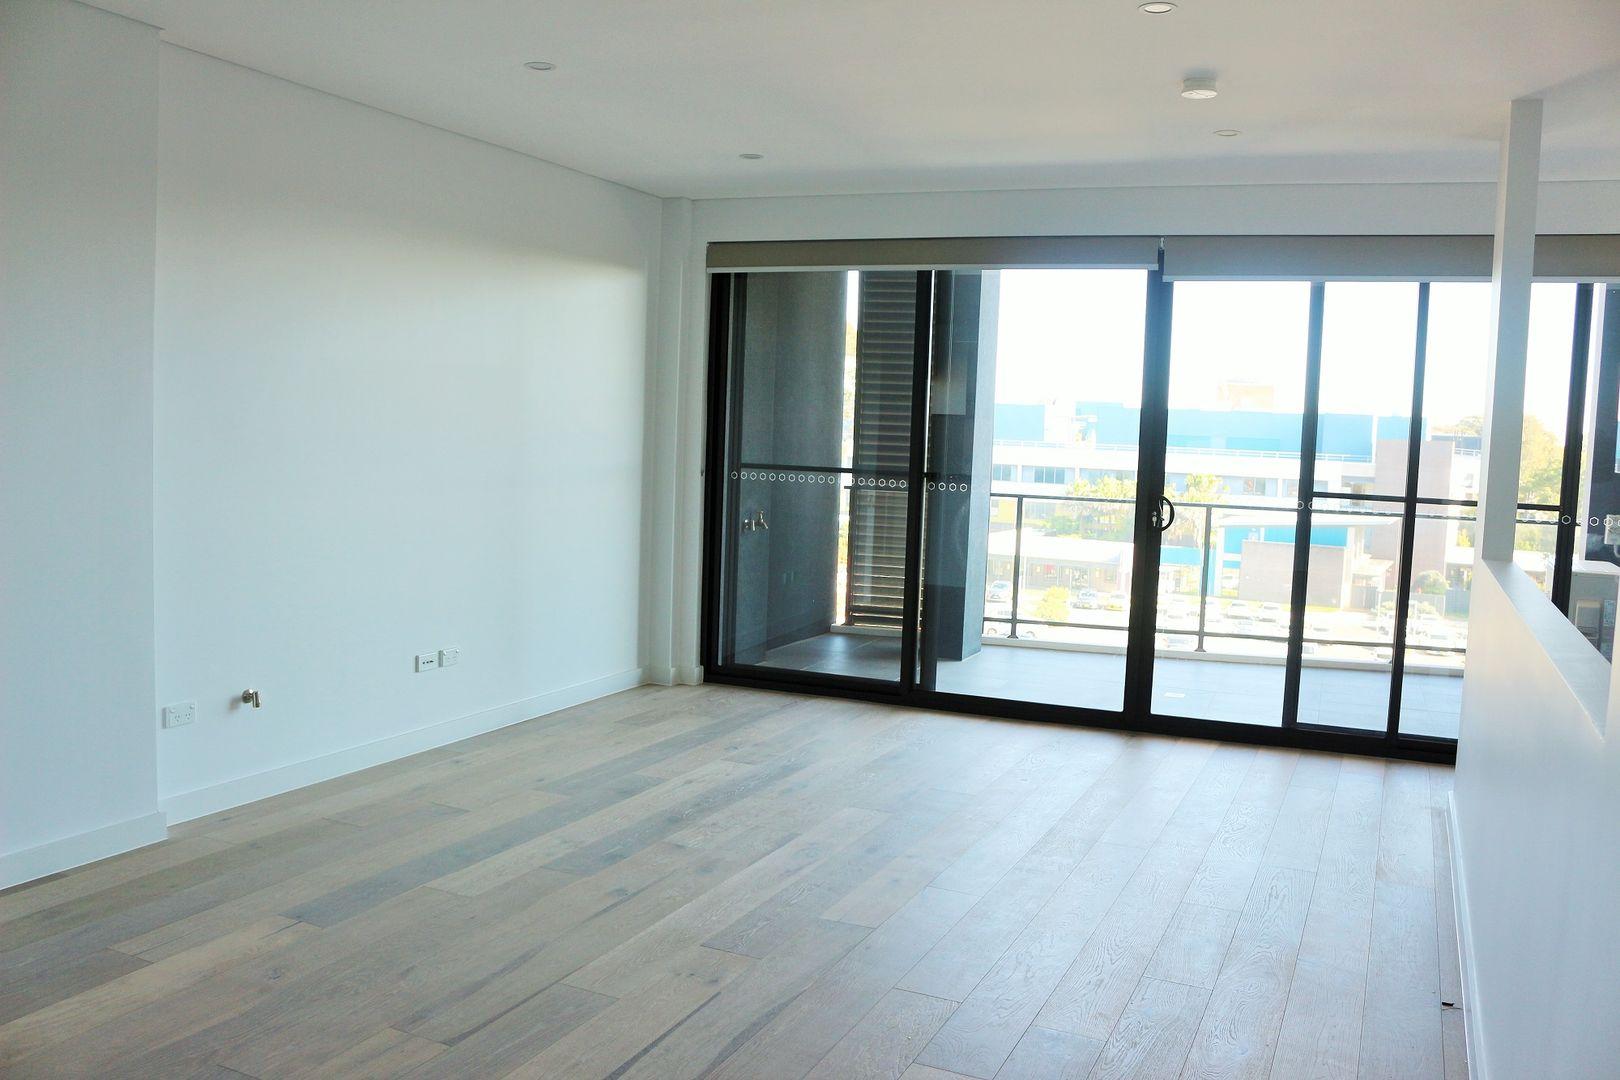 508/315 Taren Point Road, Caringbah NSW 2229 - Apartment